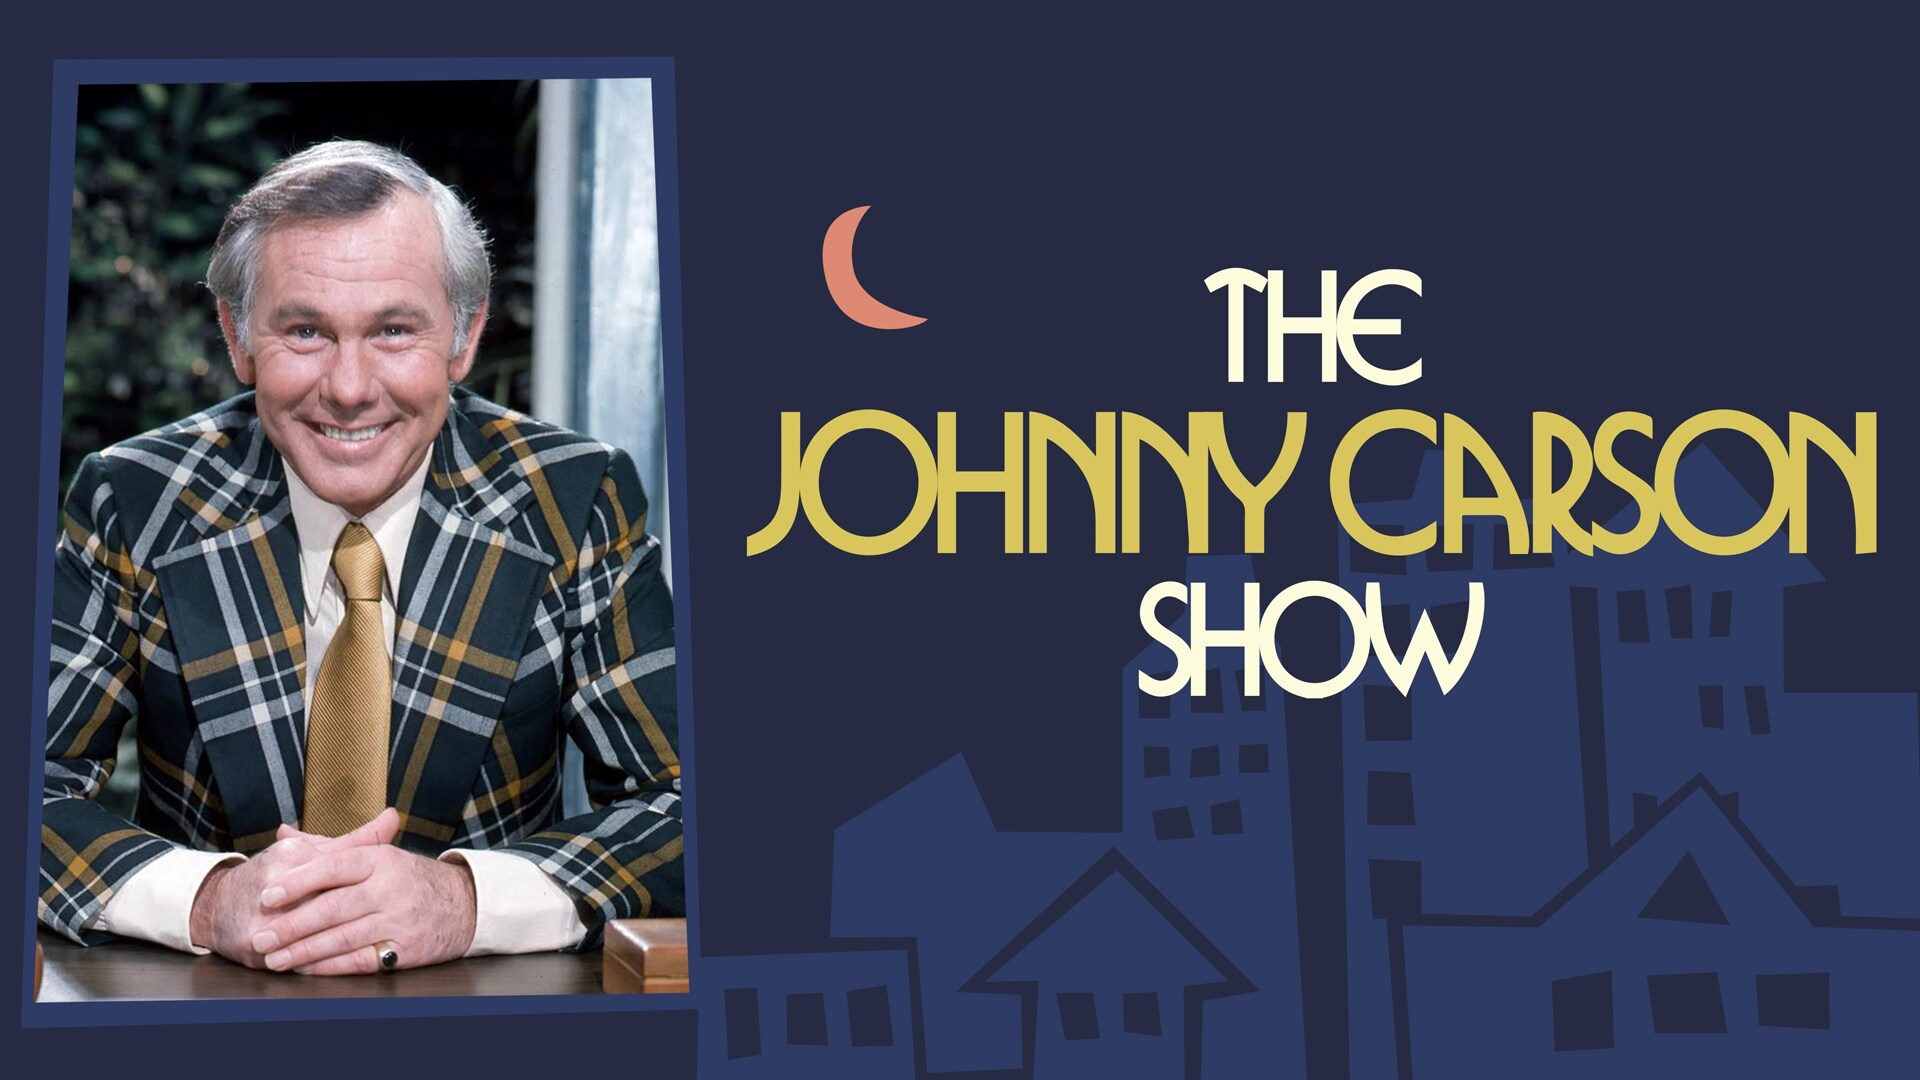 The Johnny Carson Show: Comic Legends Of The '70s - Carol Burnett (8/10/79)